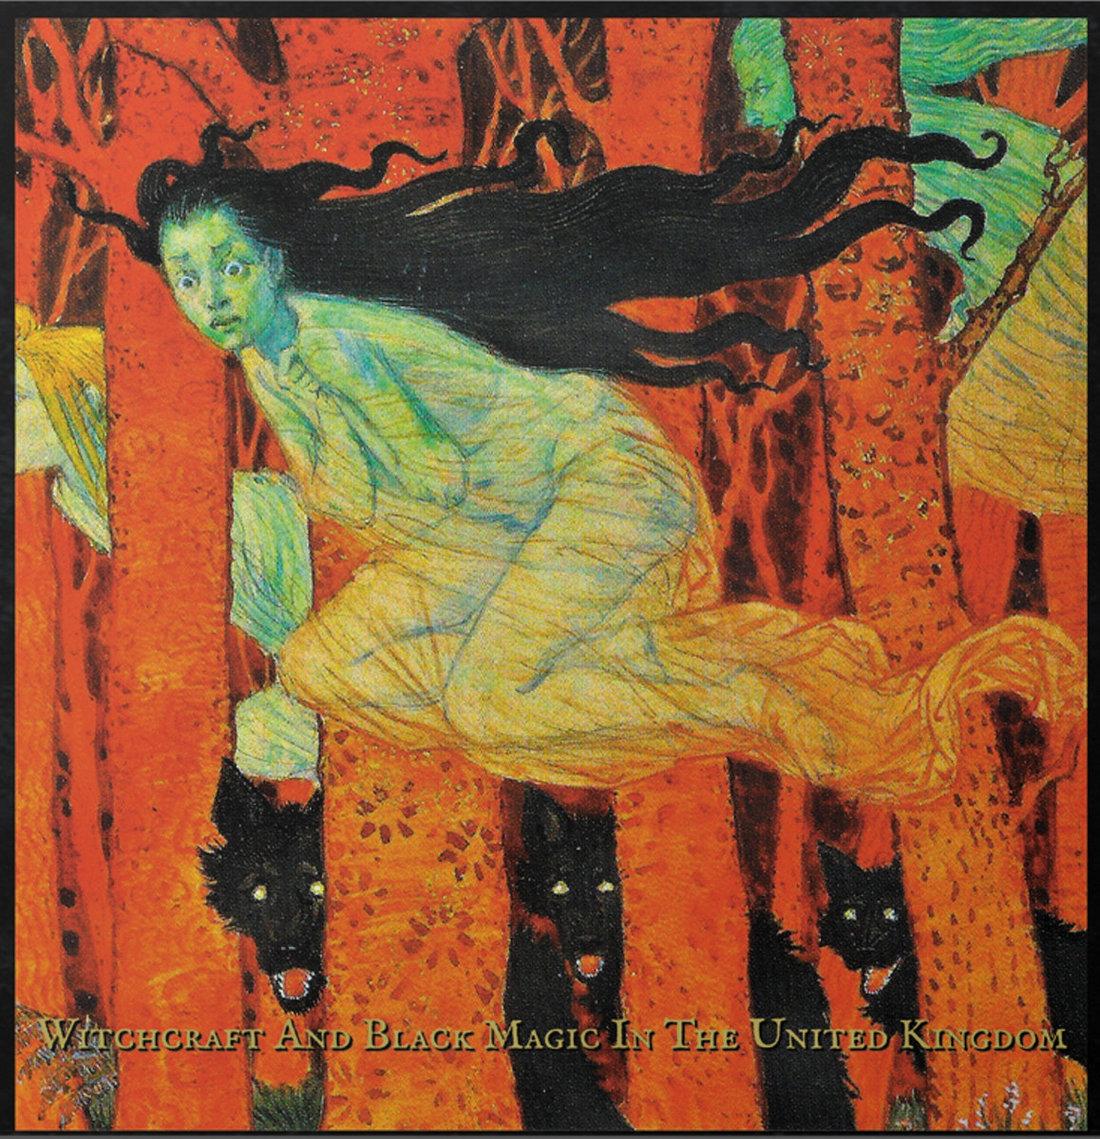 Witchcraft & Black Magic cover